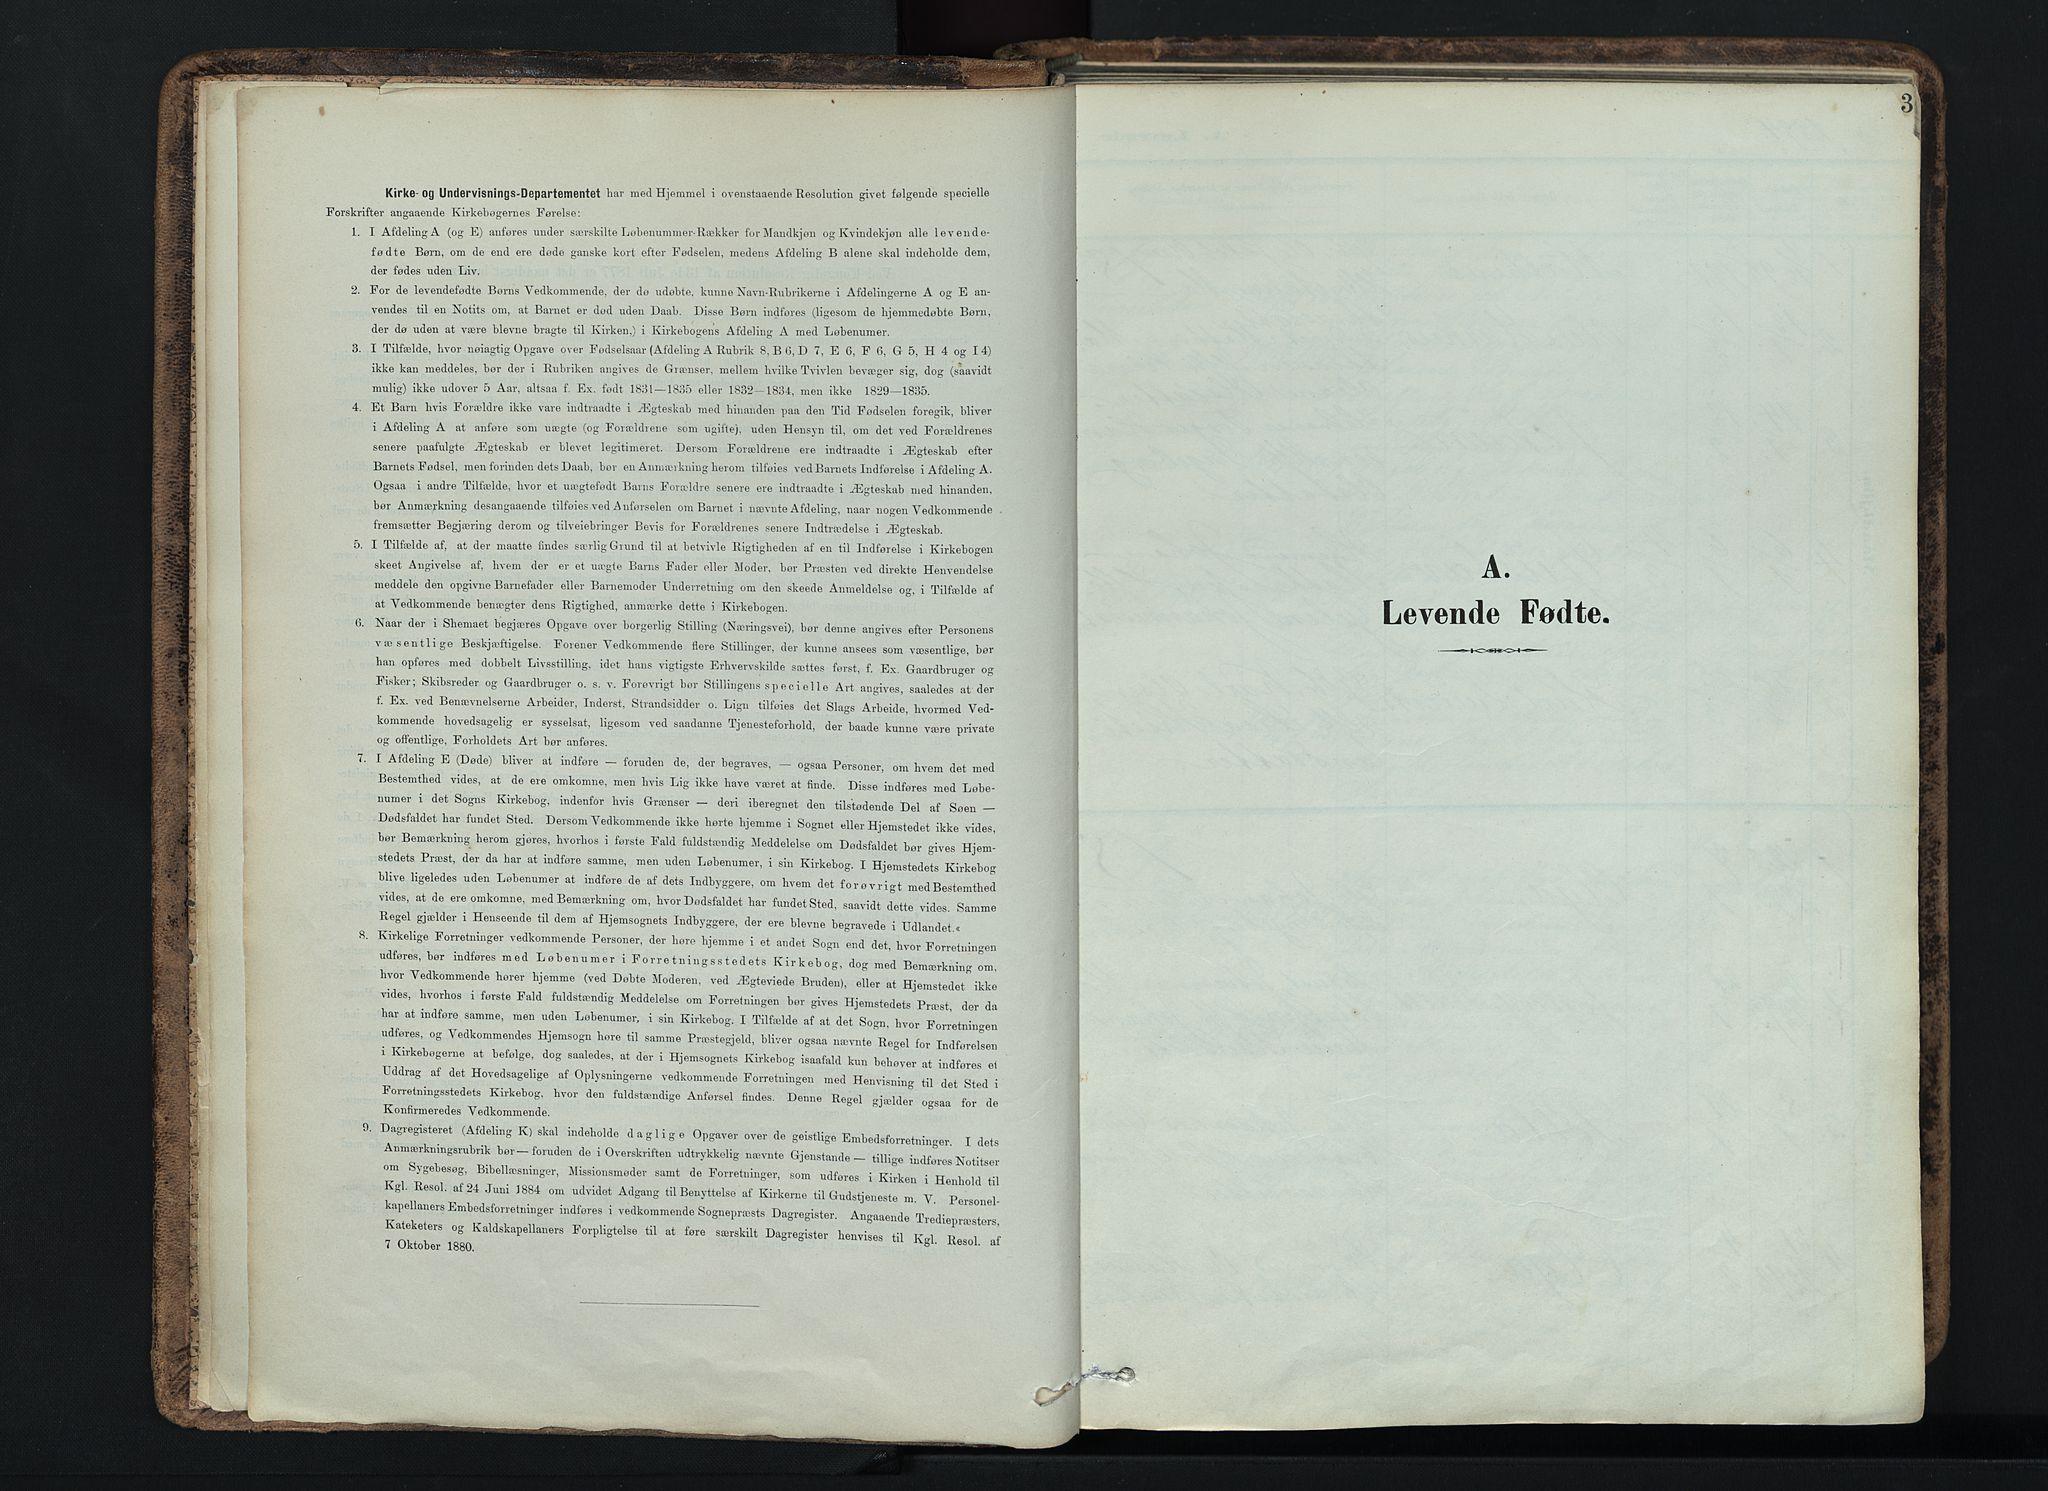 SAH, Vardal prestekontor, H/Ha/Haa/L0019: Ministerialbok nr. 19, 1893-1907, s. 3